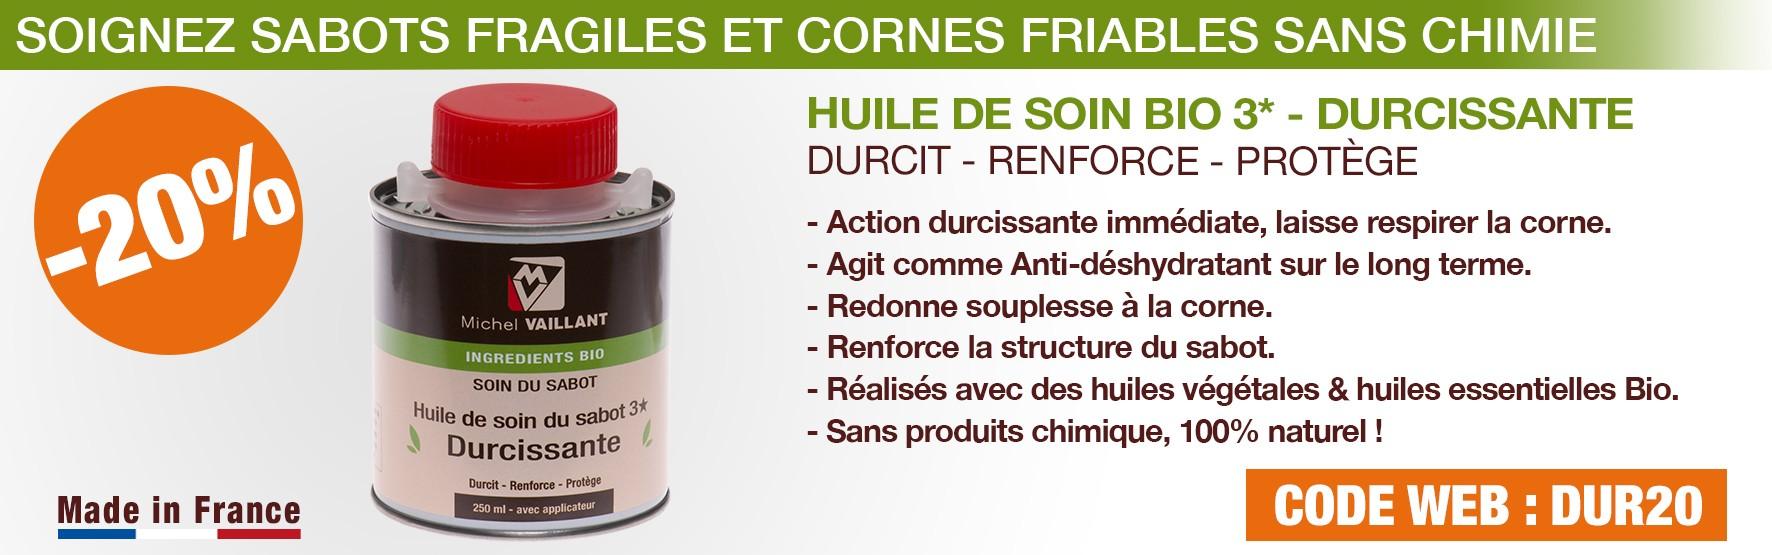 Durcissant - huile - sabot - fragile - friable - durcir - sabots - pied - cheval - soin